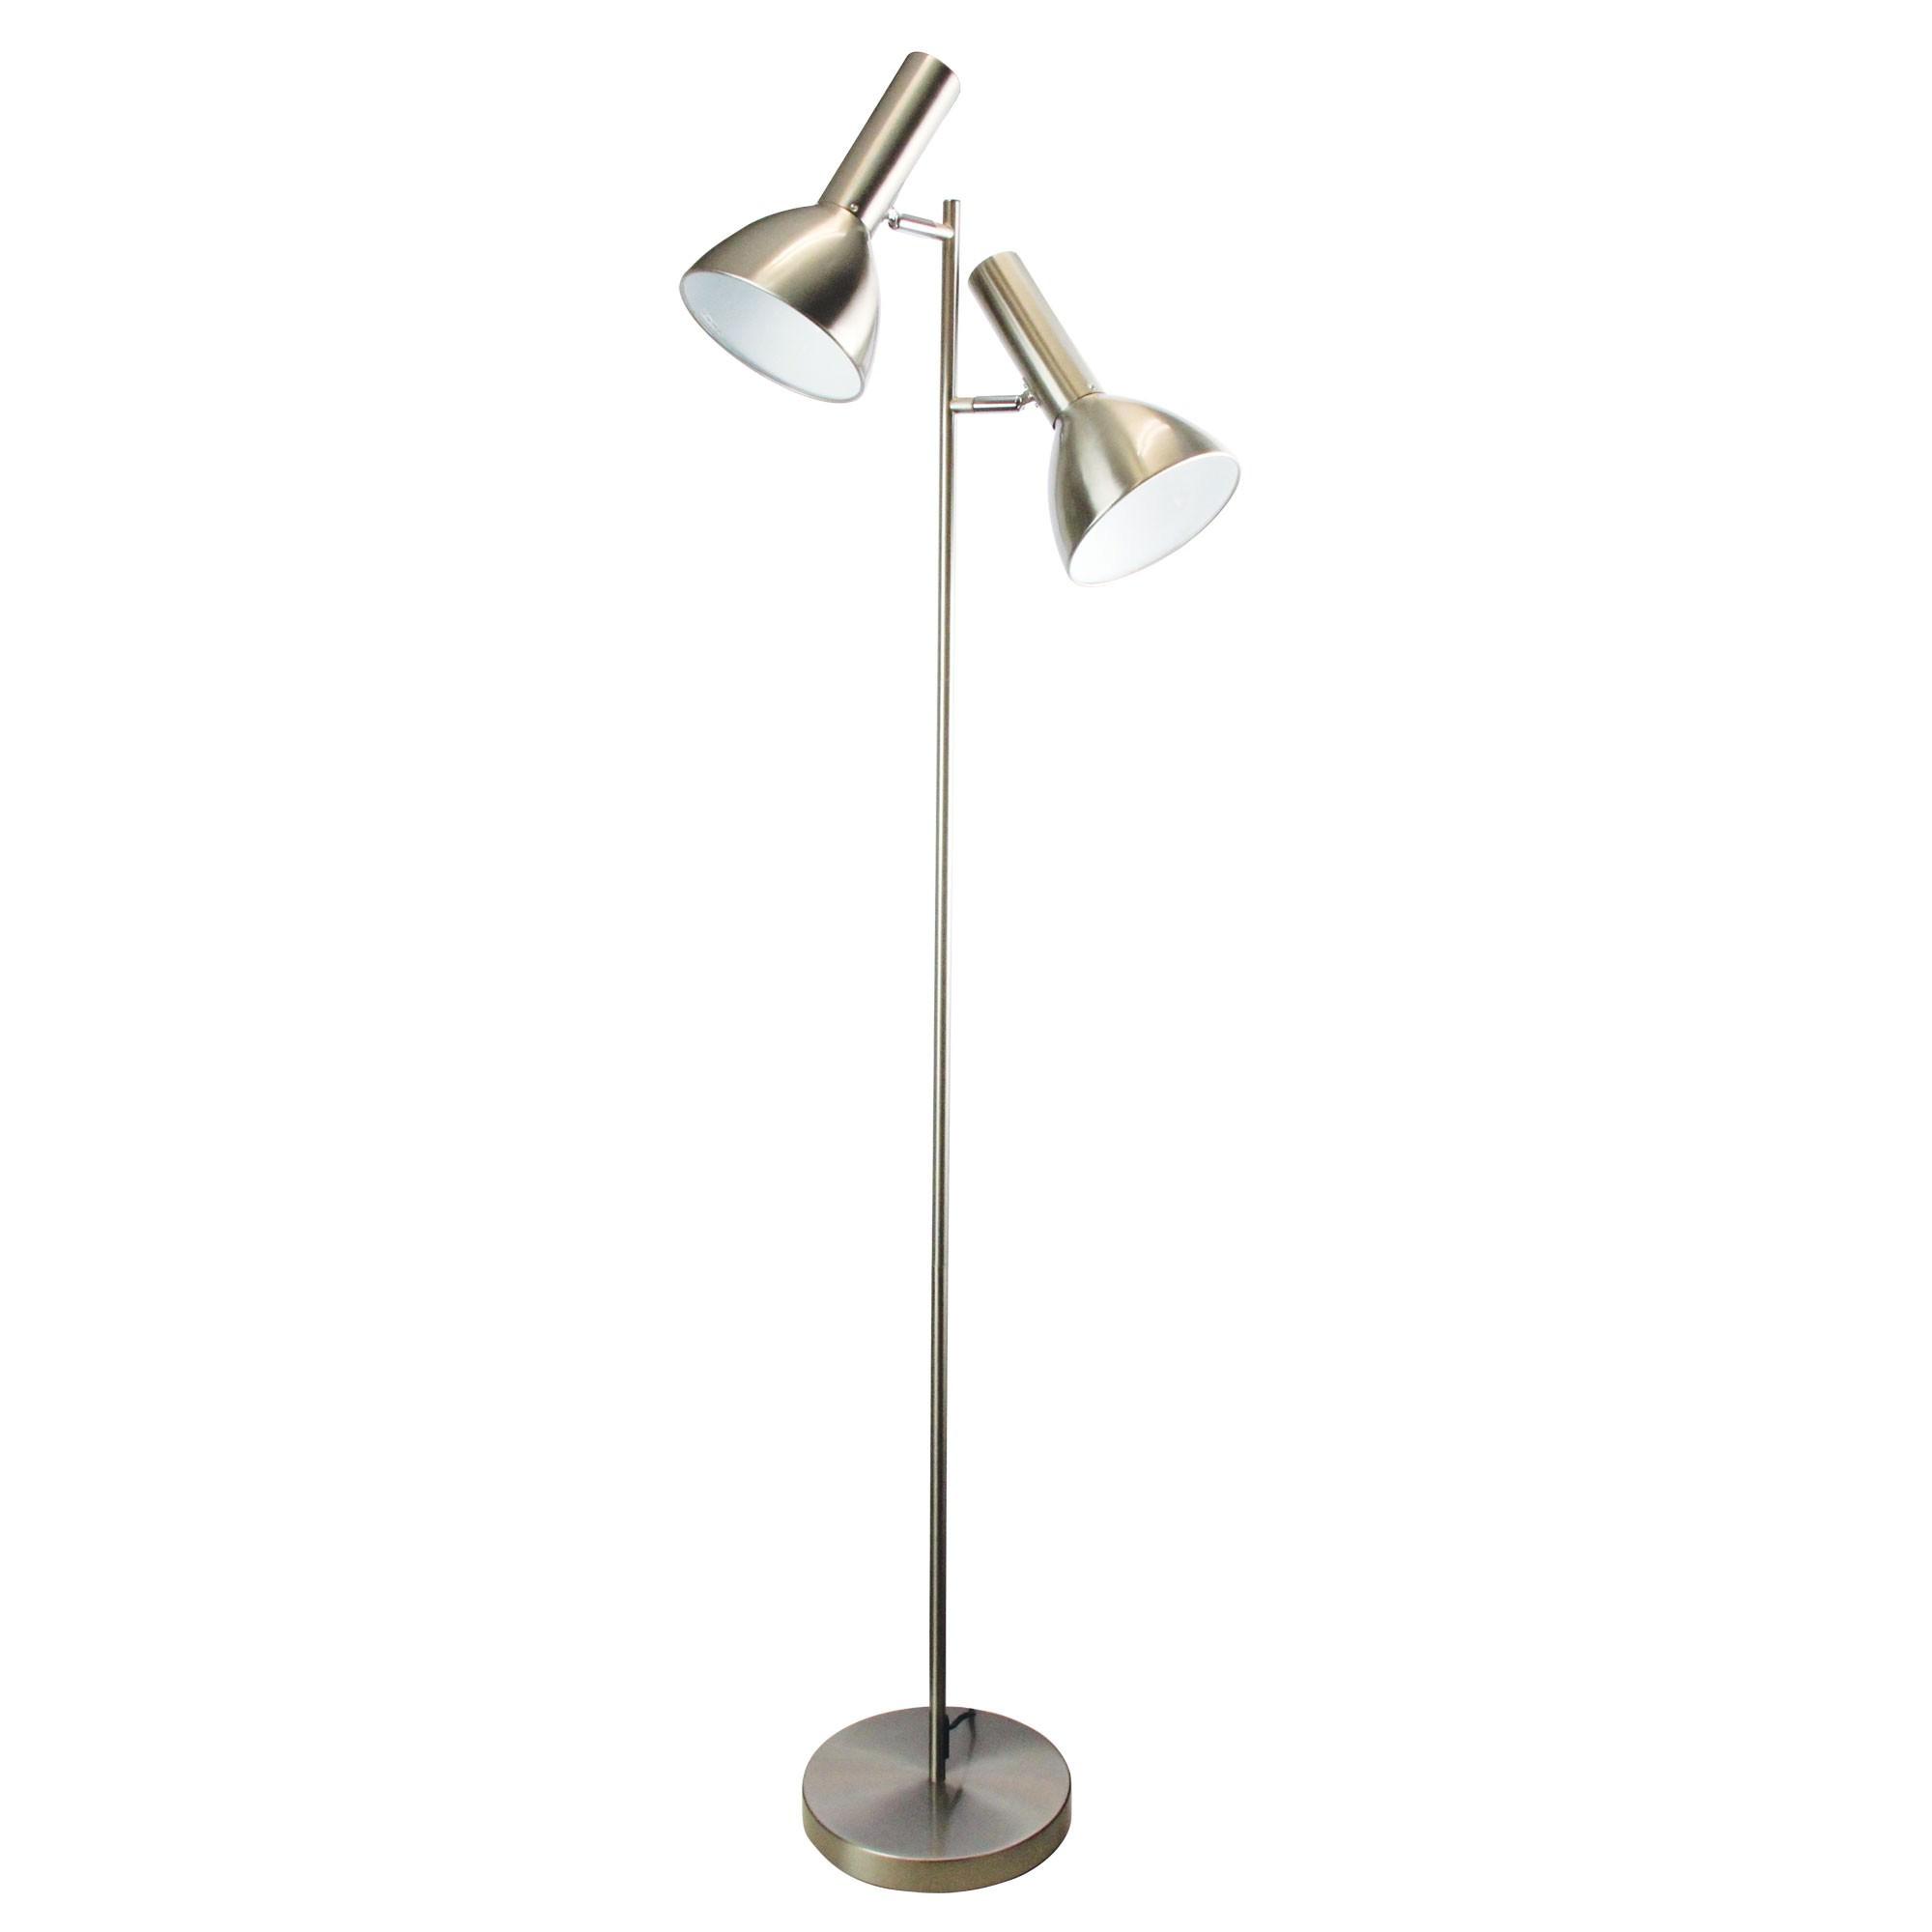 Vespa Metal Twin Floor Lamp, Brushed Chrome